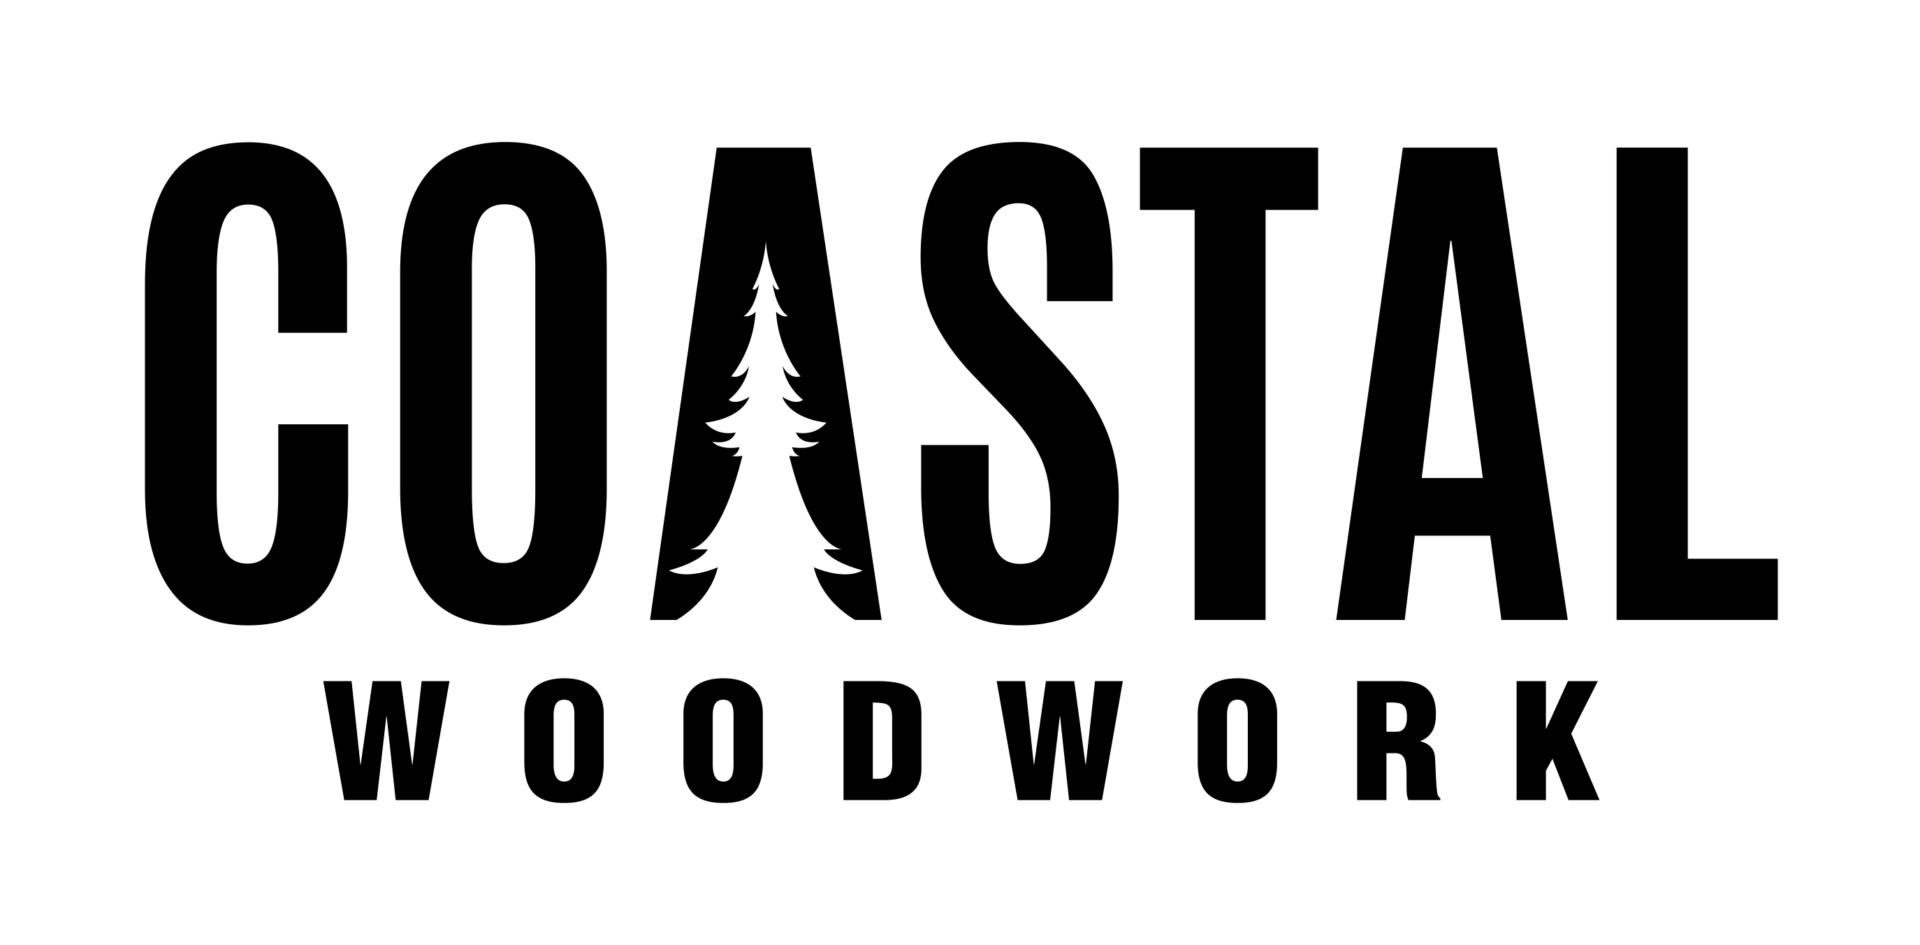 https://hawkmazzottamotocamp.com/wp-content/uploads/2021/03/Sponsor_Coastal_Woodwork-edited.png